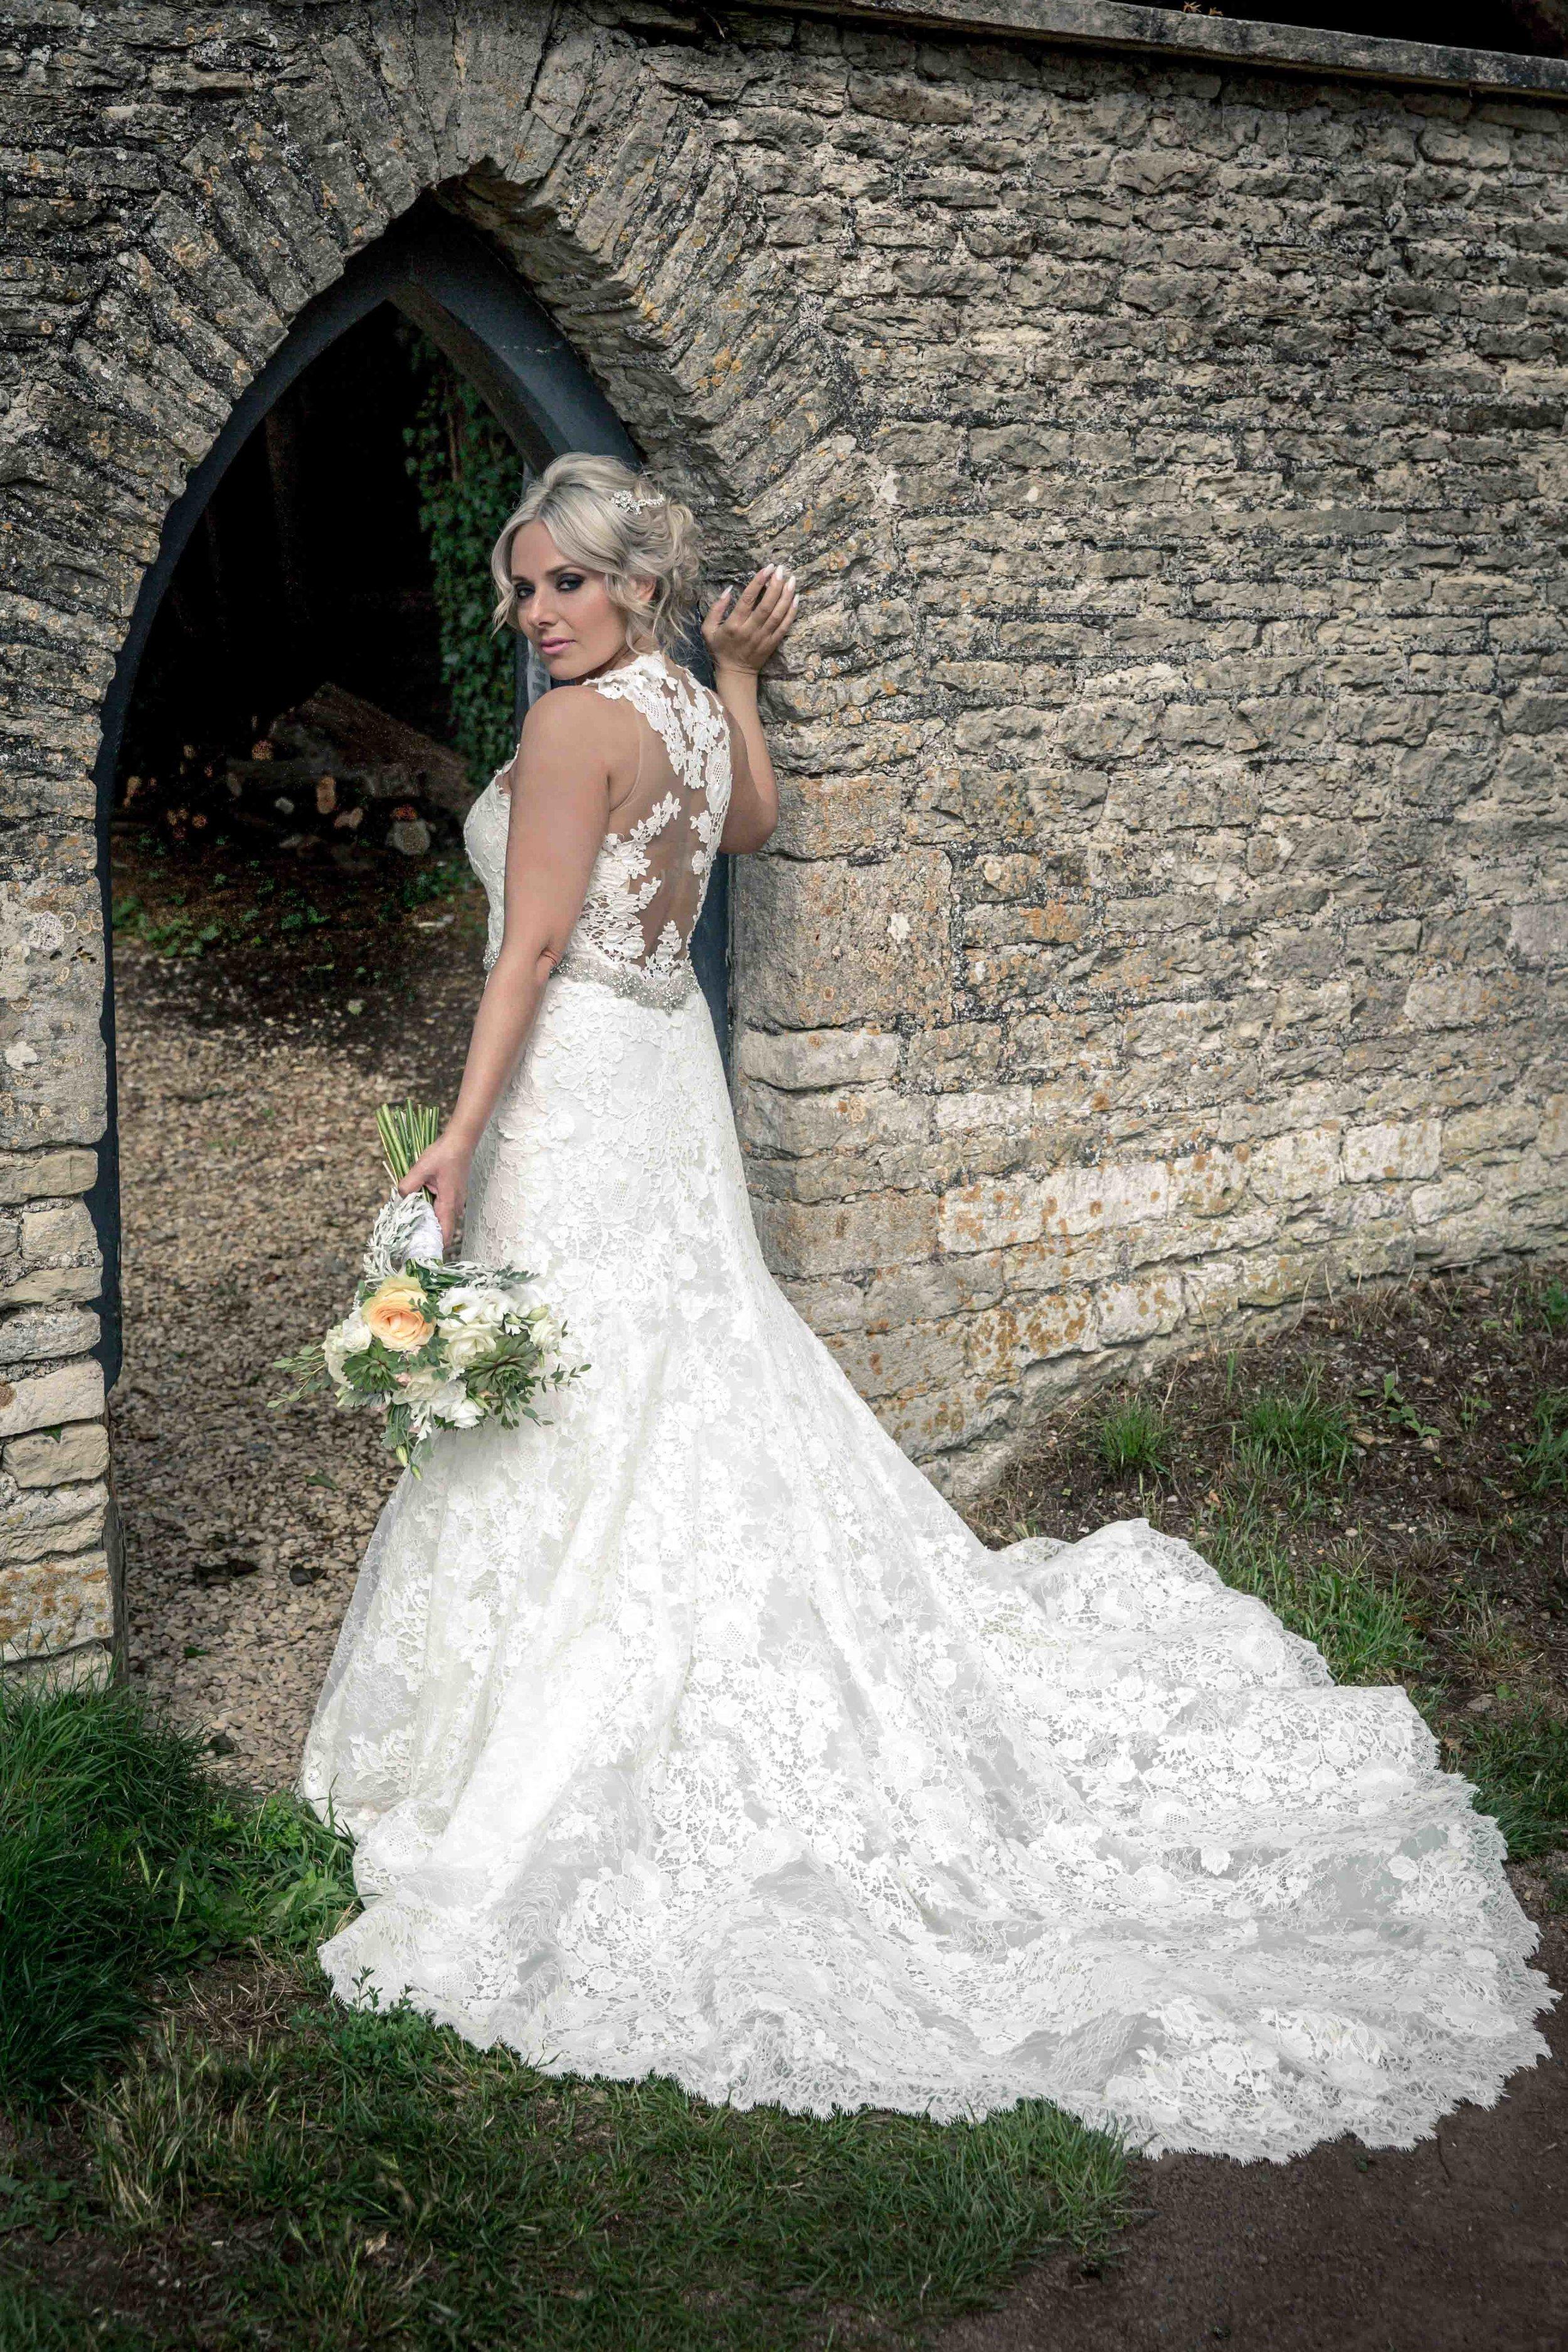 cotswold-wedding-photography-at-stonehouse-court-hotel-natalia-smith-photography-gloucestershire-wedding-photographer-65.jpg